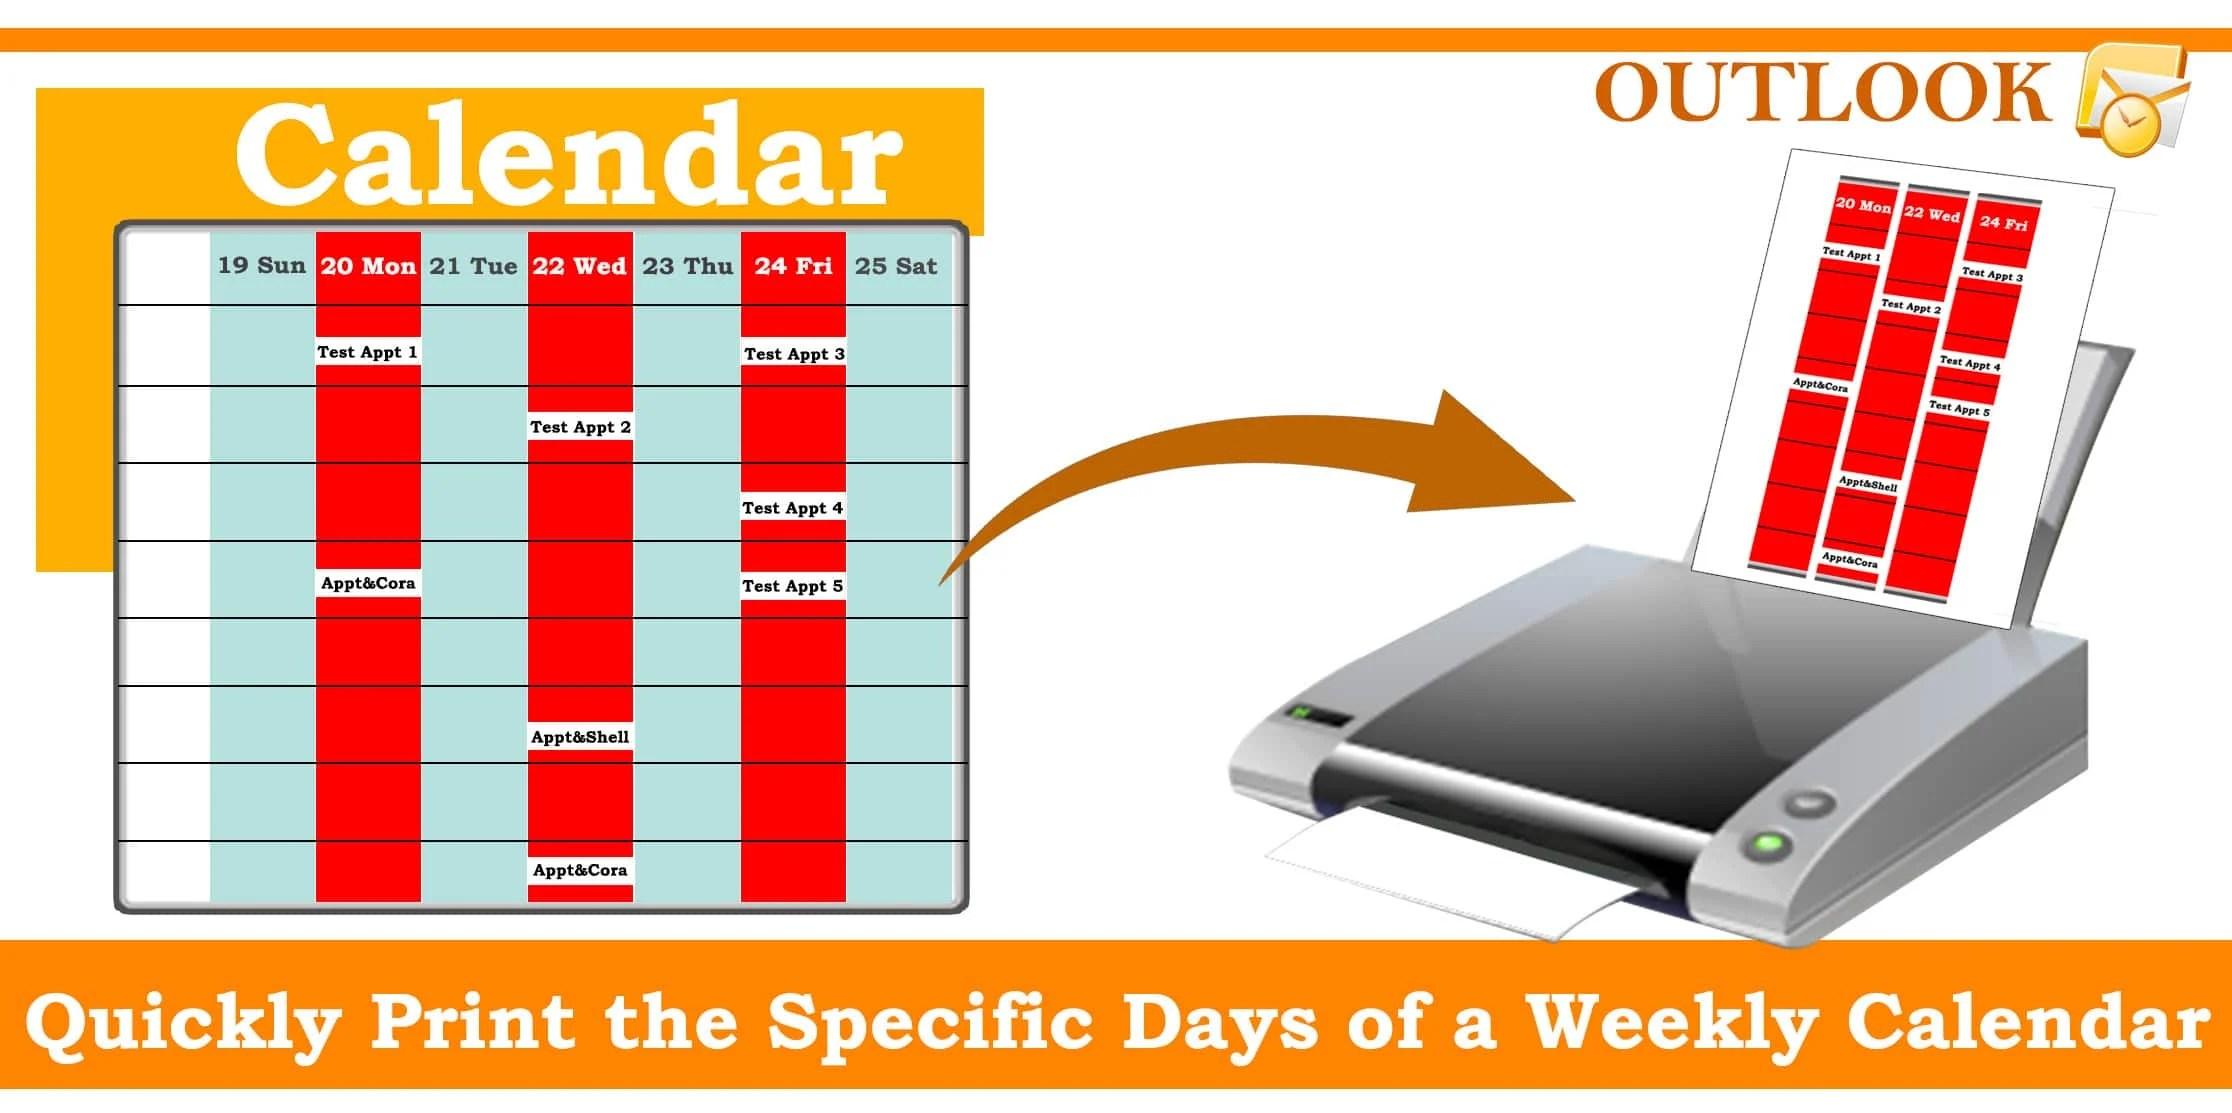 Weekly Calendar Print Out Akbaeenw